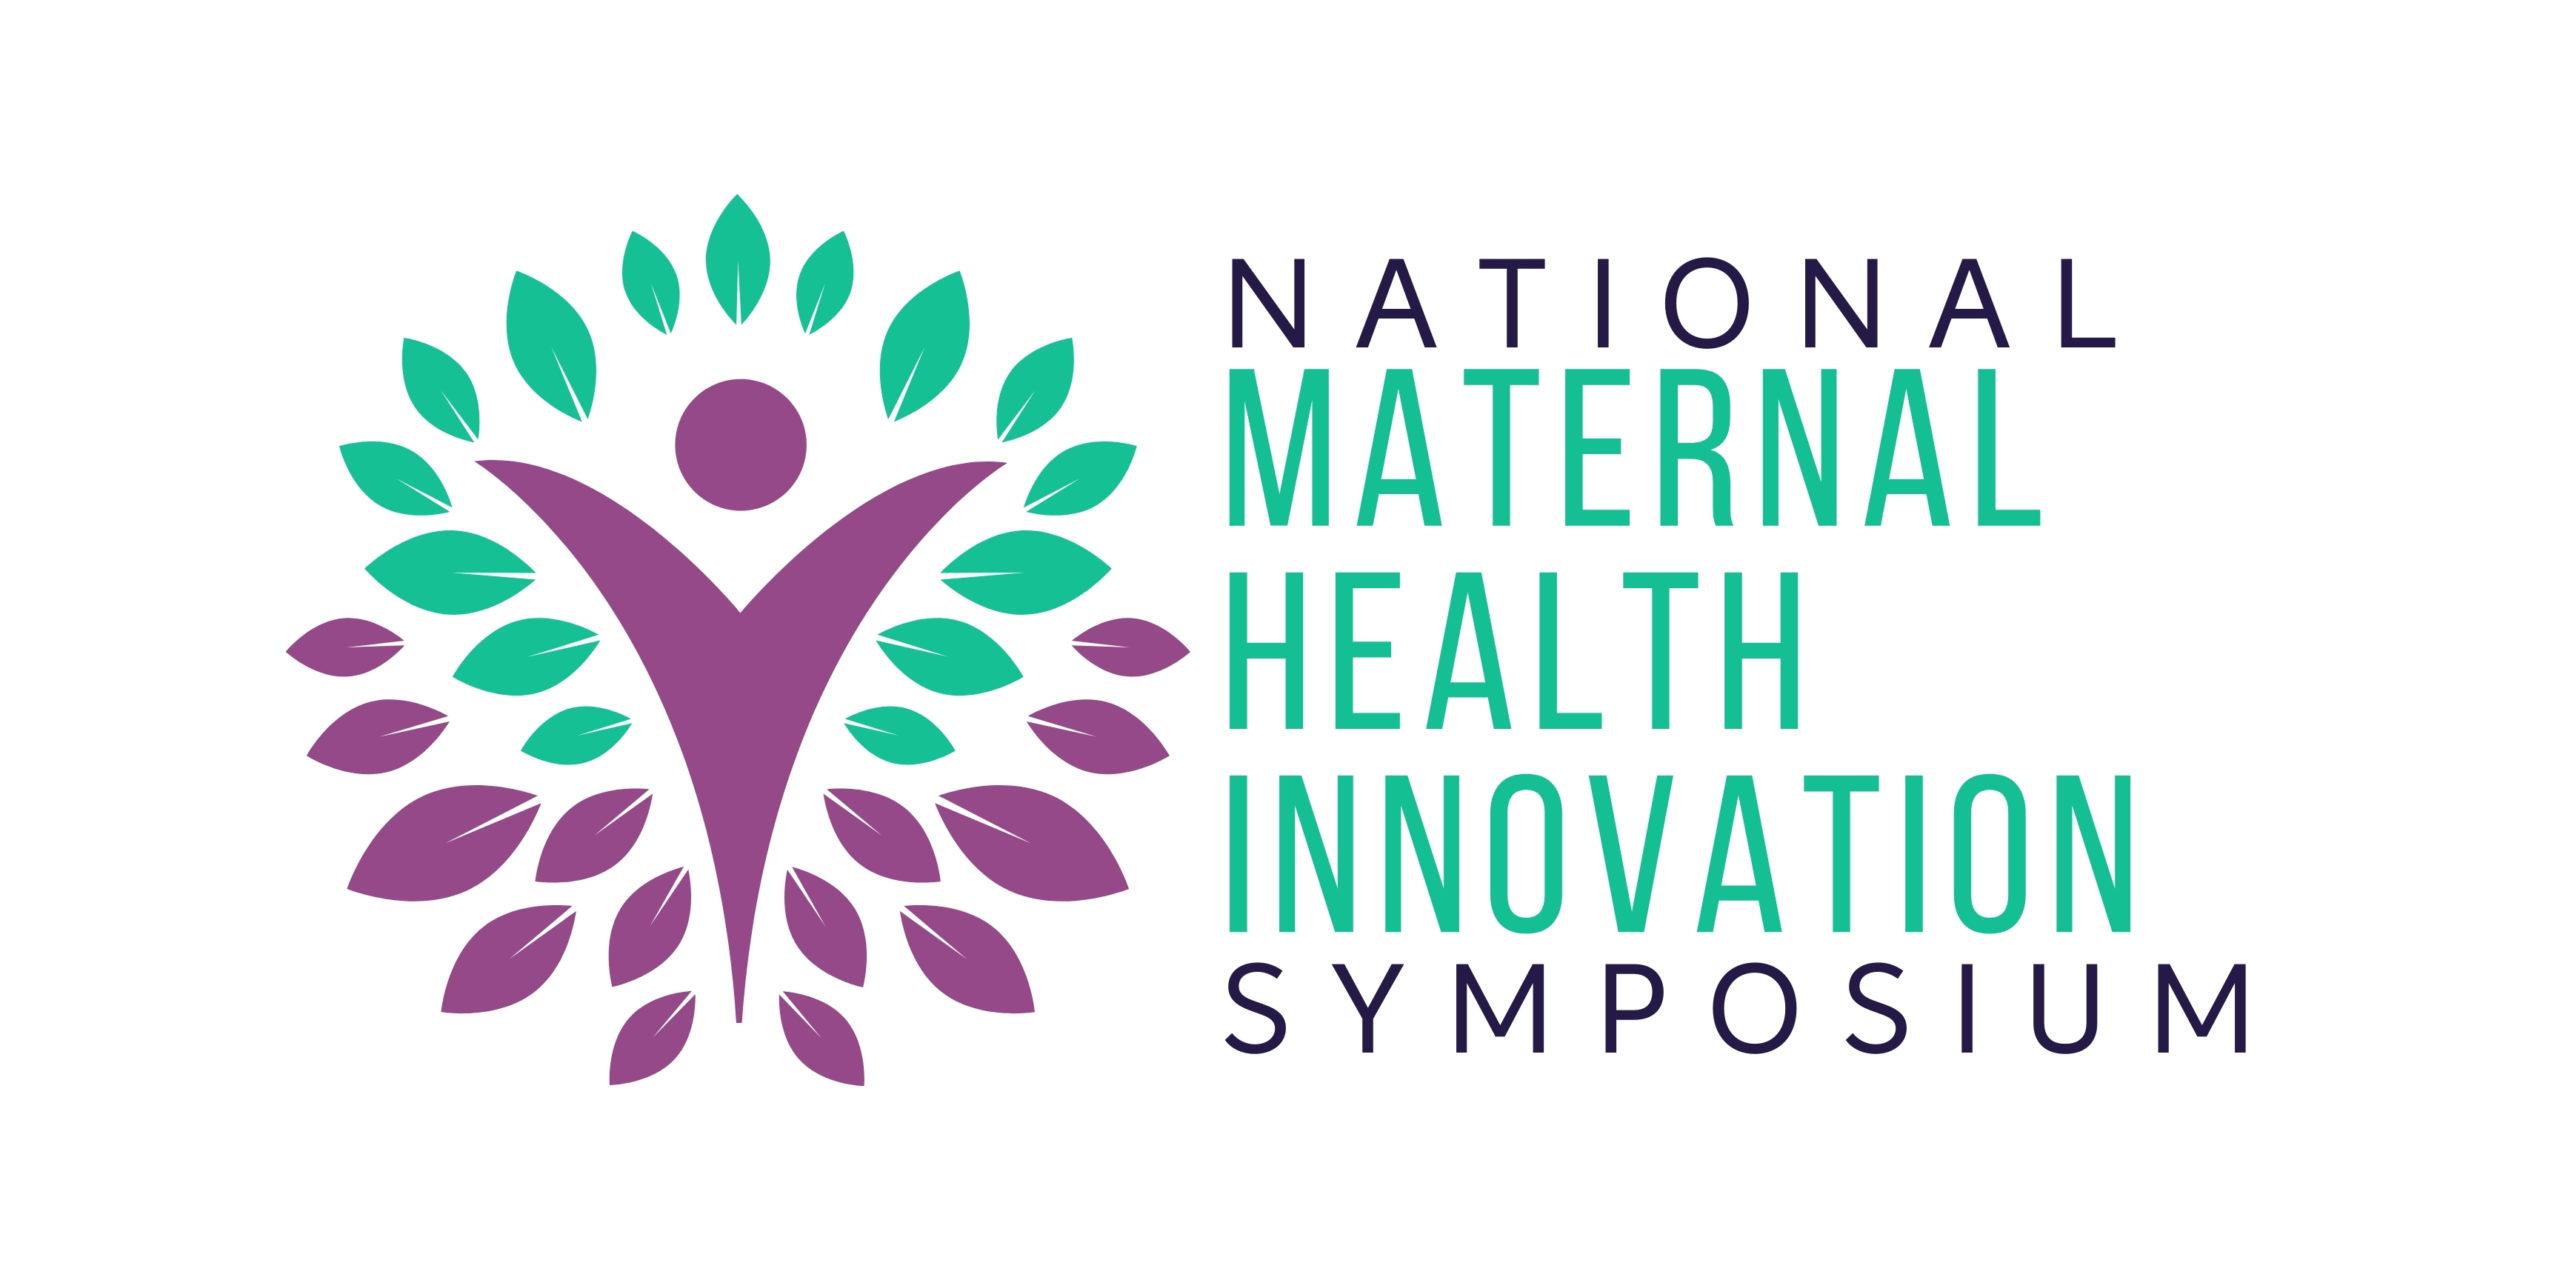 2021 National Maternal Health Innovation Symposium(1)